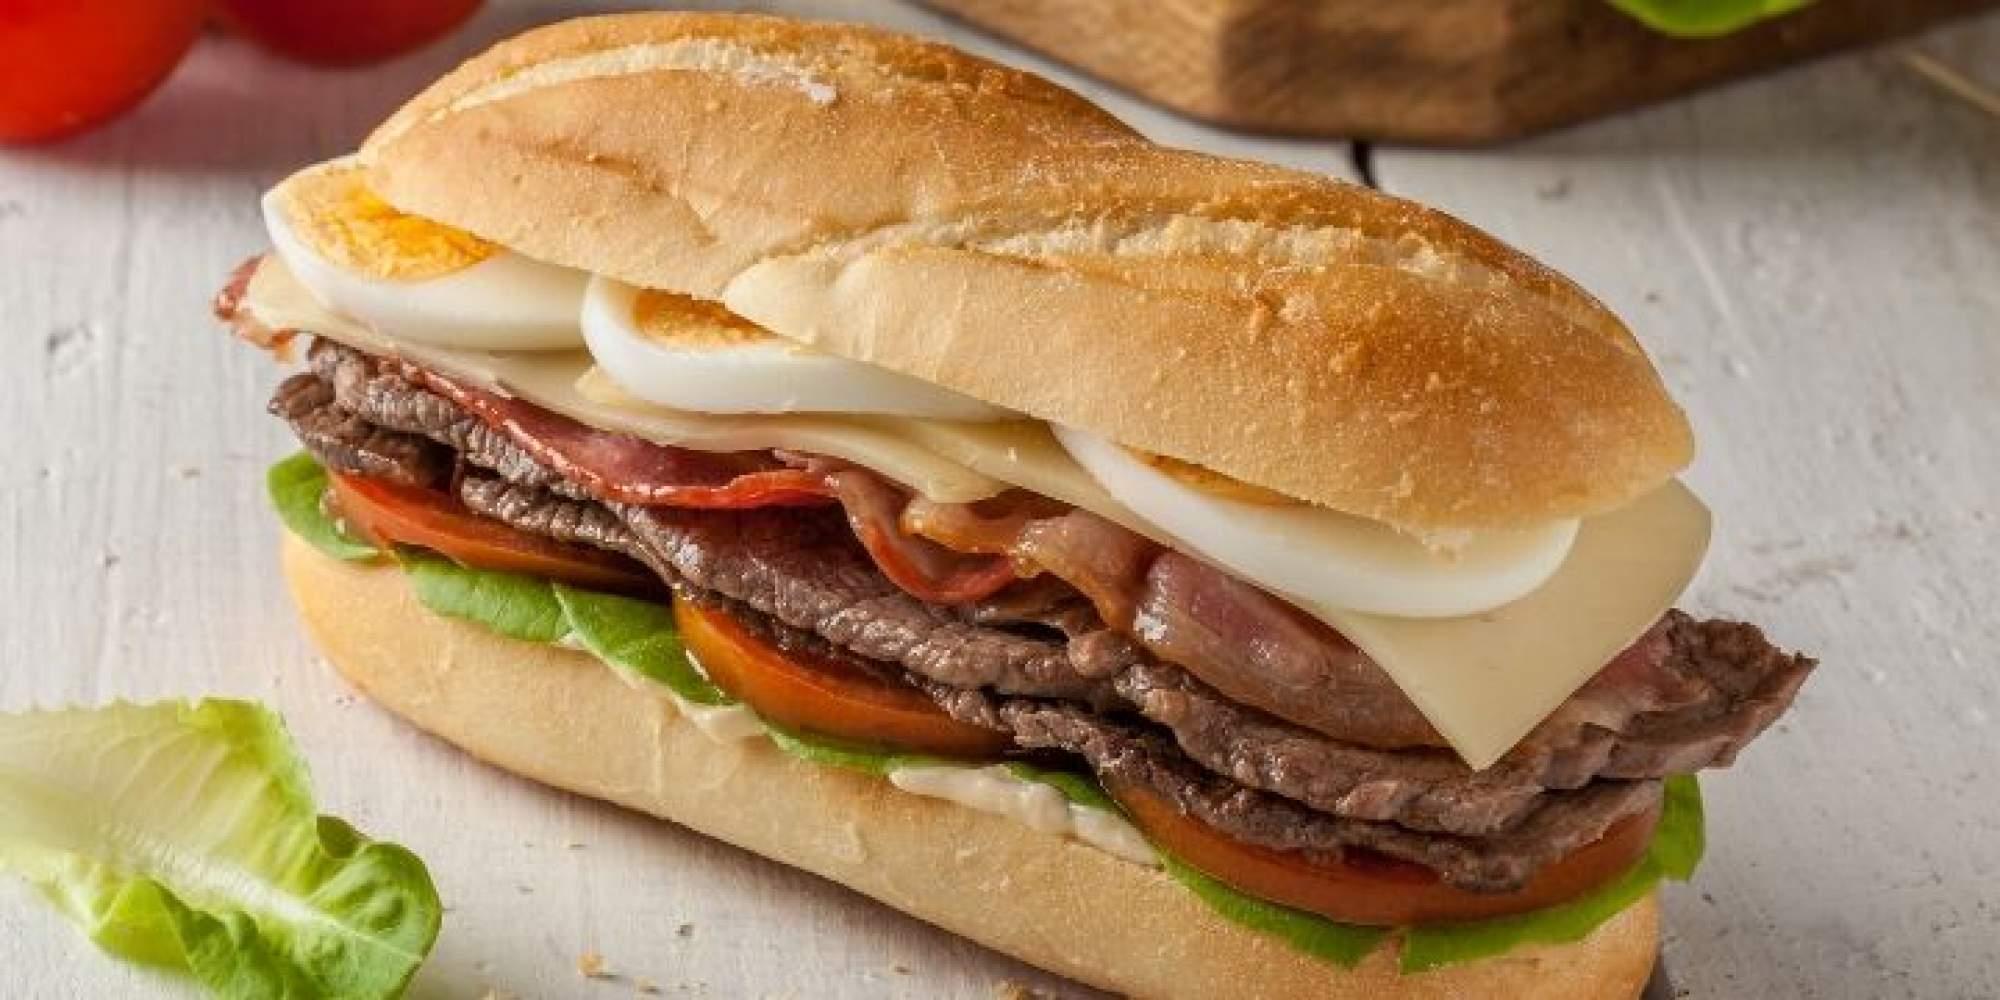 National Sandwich day | Chivito-Uruguay | AllClear Travel Blog